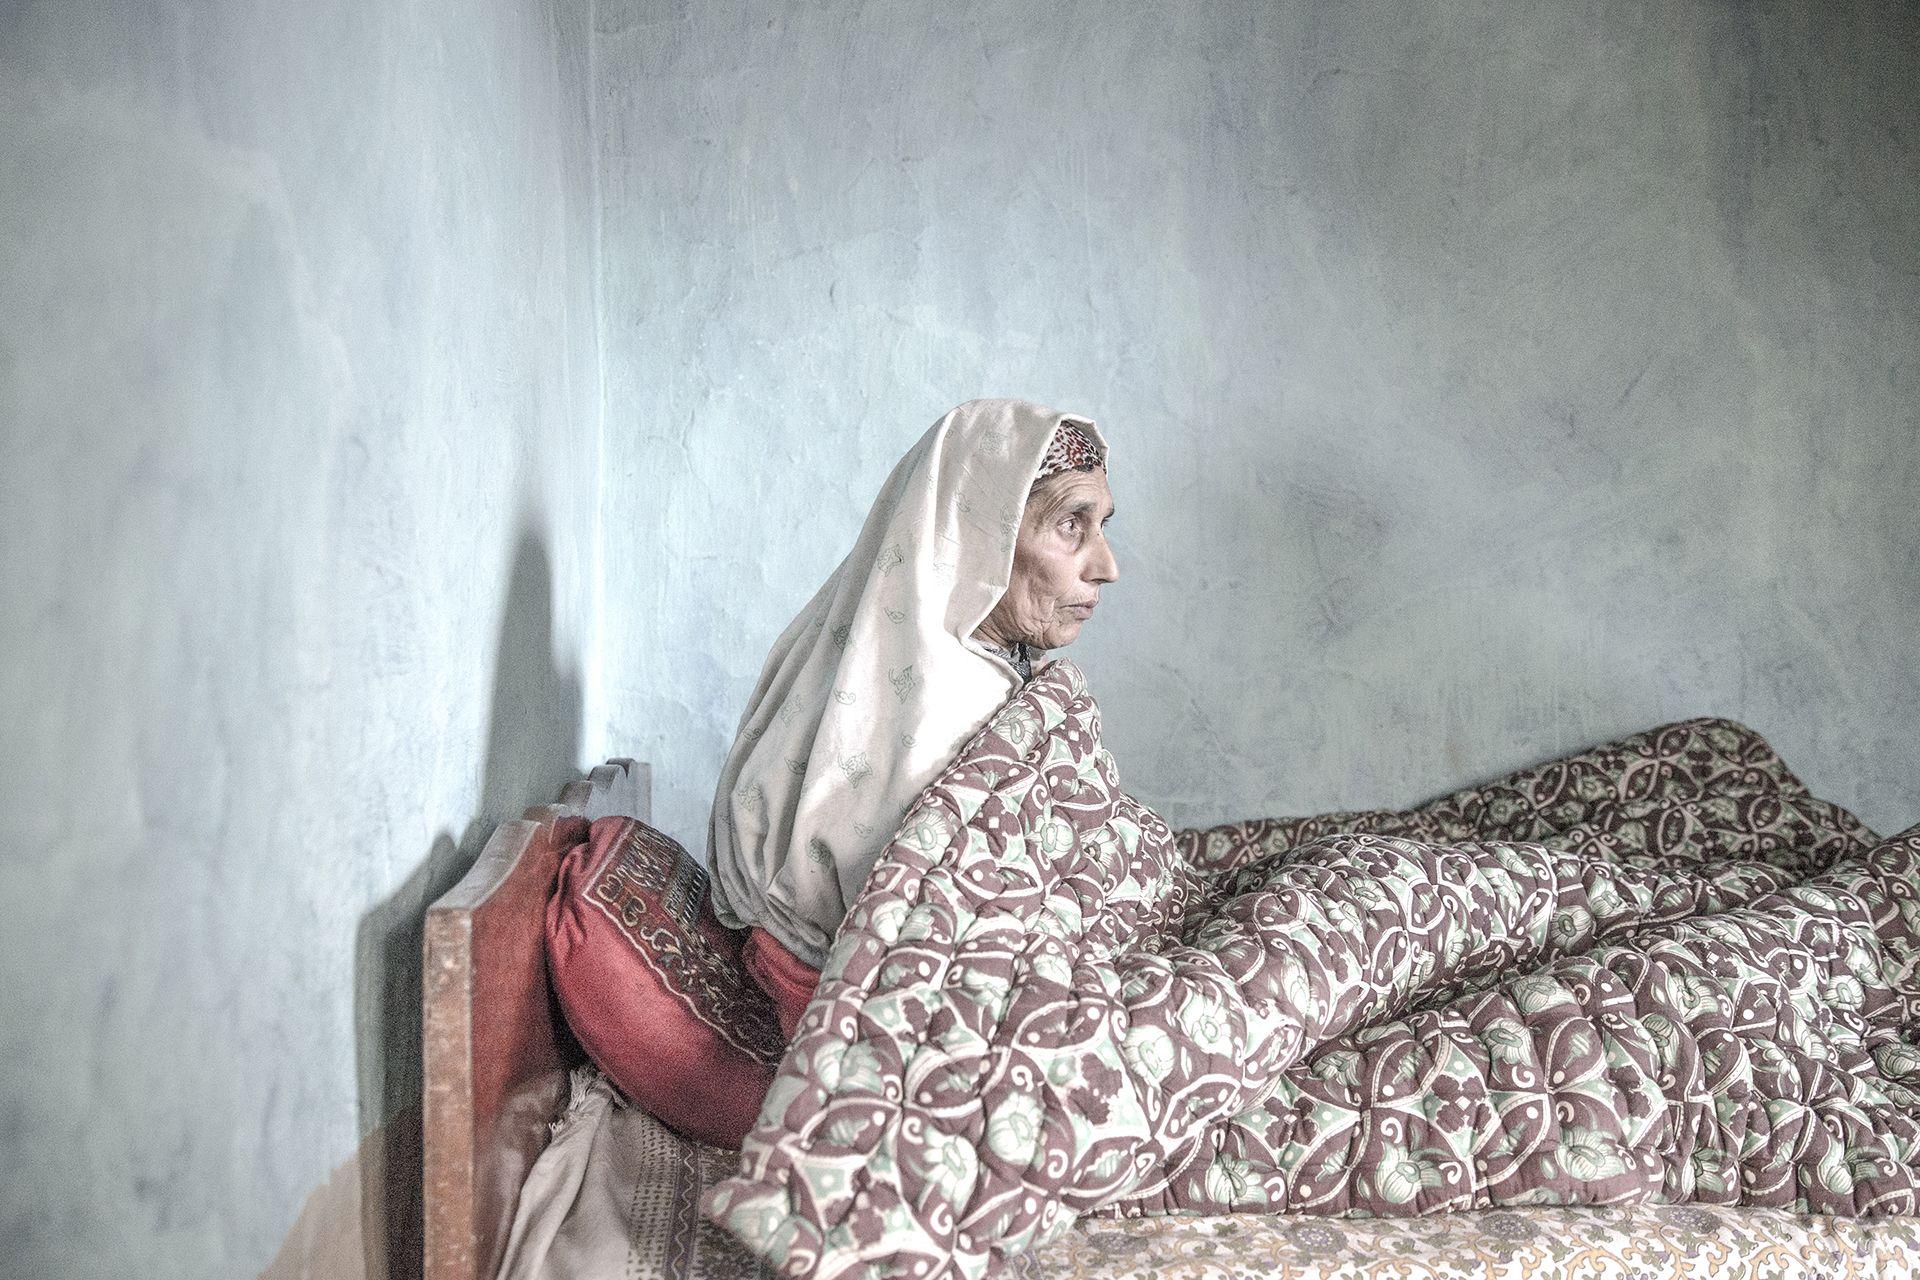 Waiting in Limbo: Kashmir's Half-Widow